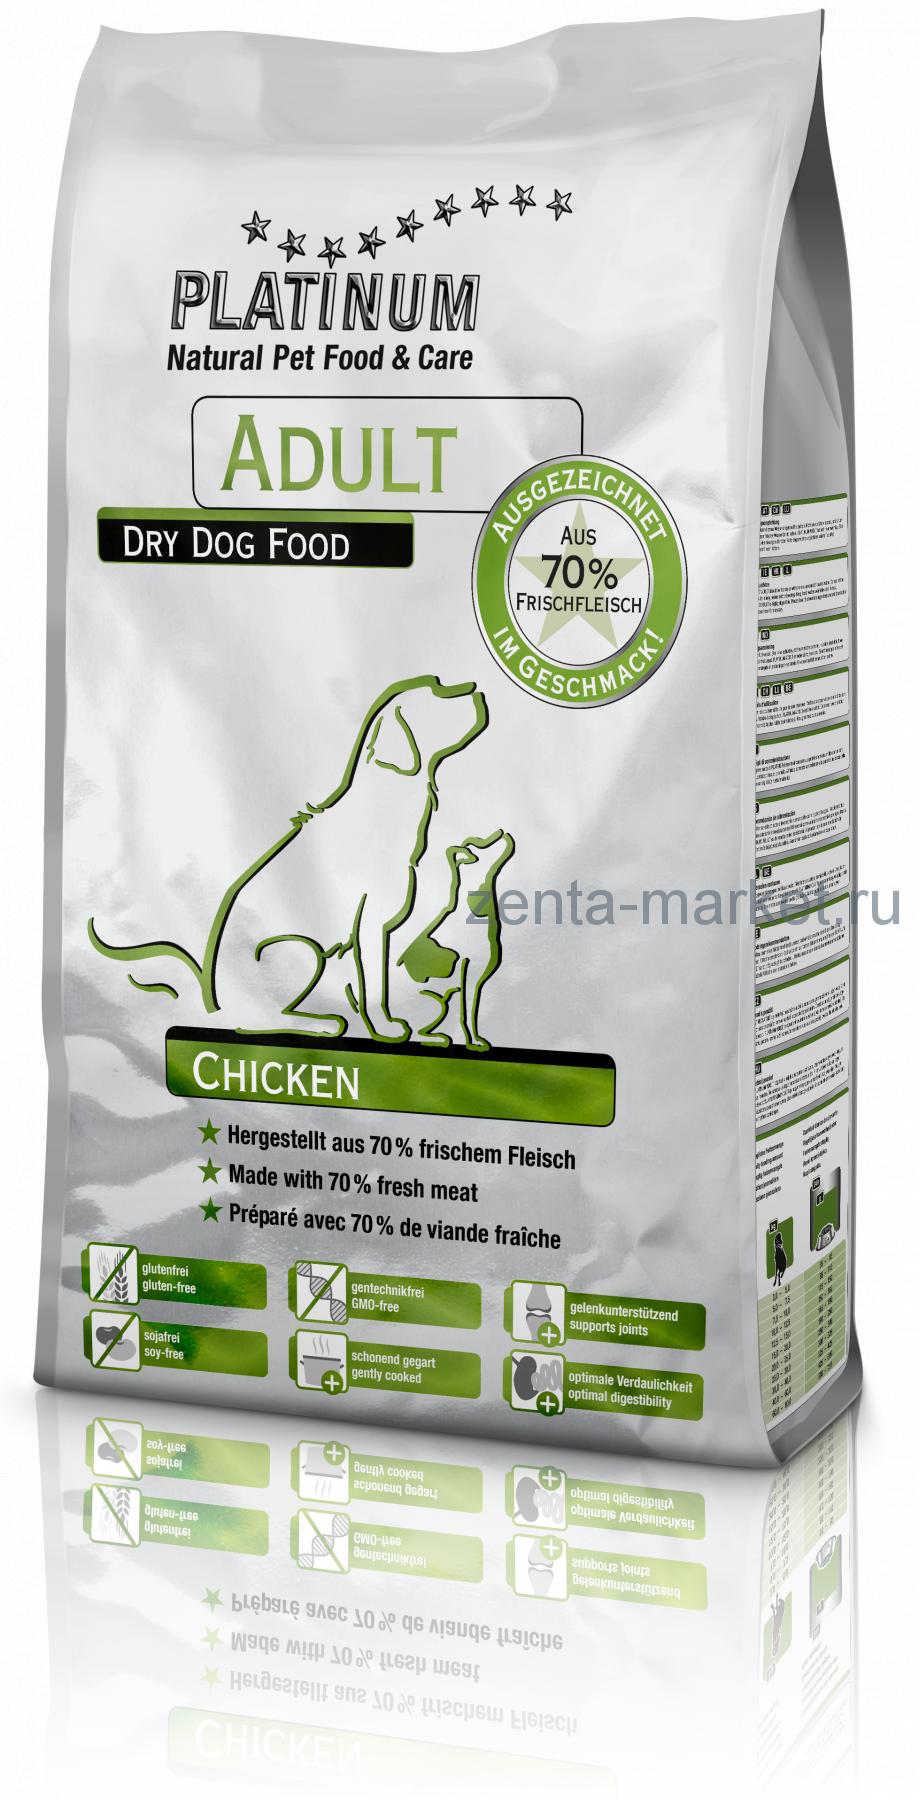 Platinum Сhicken (курица для взрослых собак) 1.5кг, 5кг,10кг, 15кг, 31.5 кг;